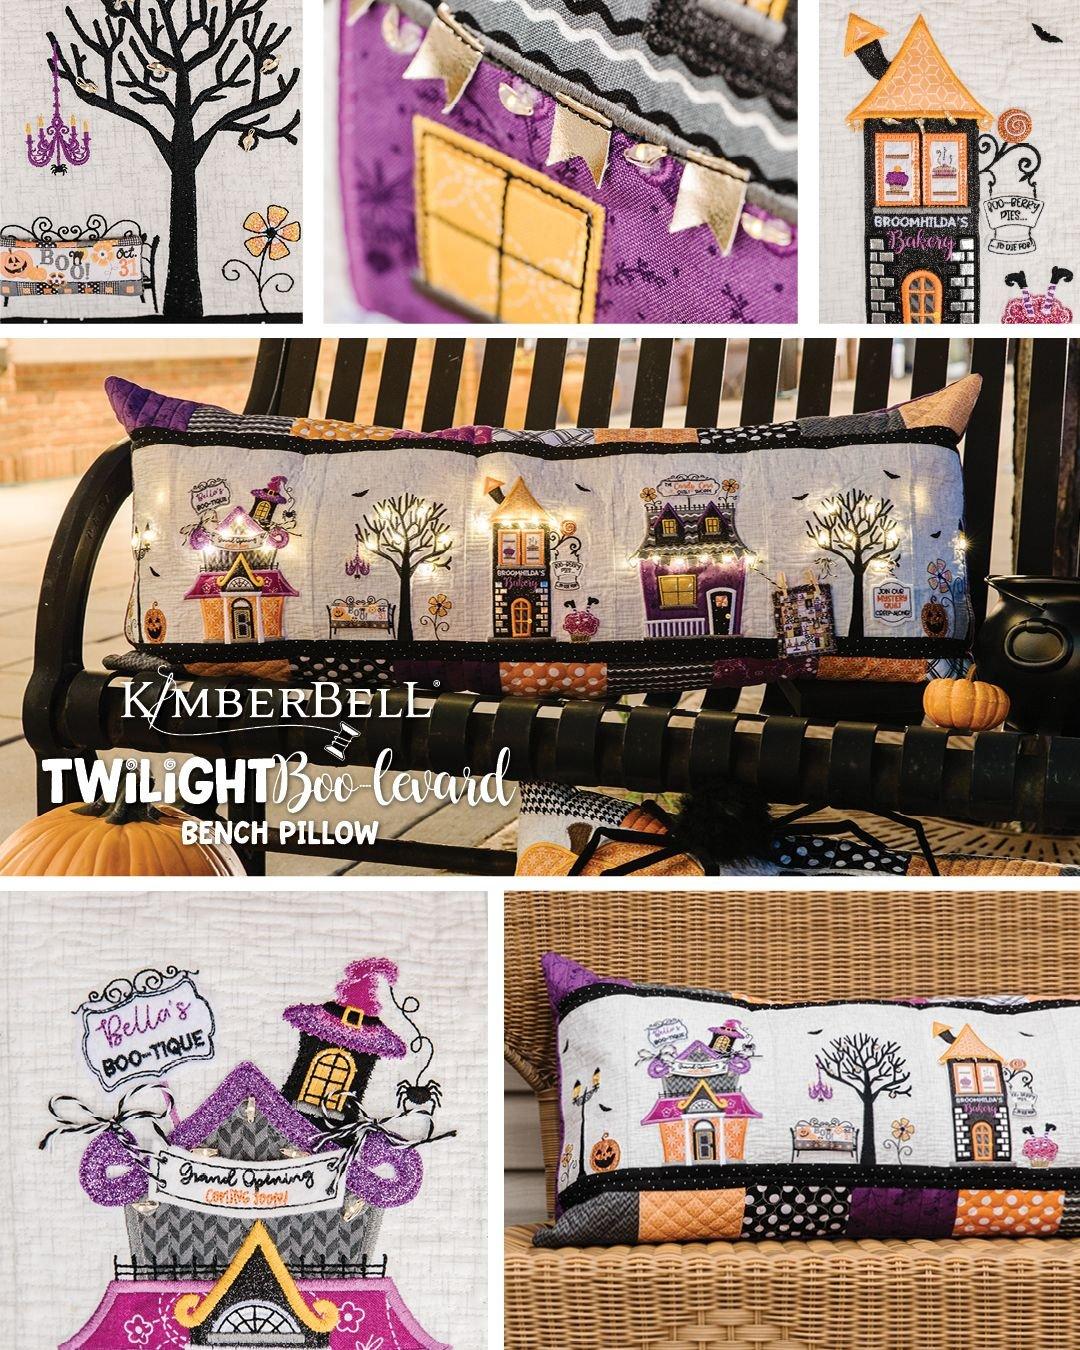 Twilight Boo-levard Bench Pillow Fabric Kit